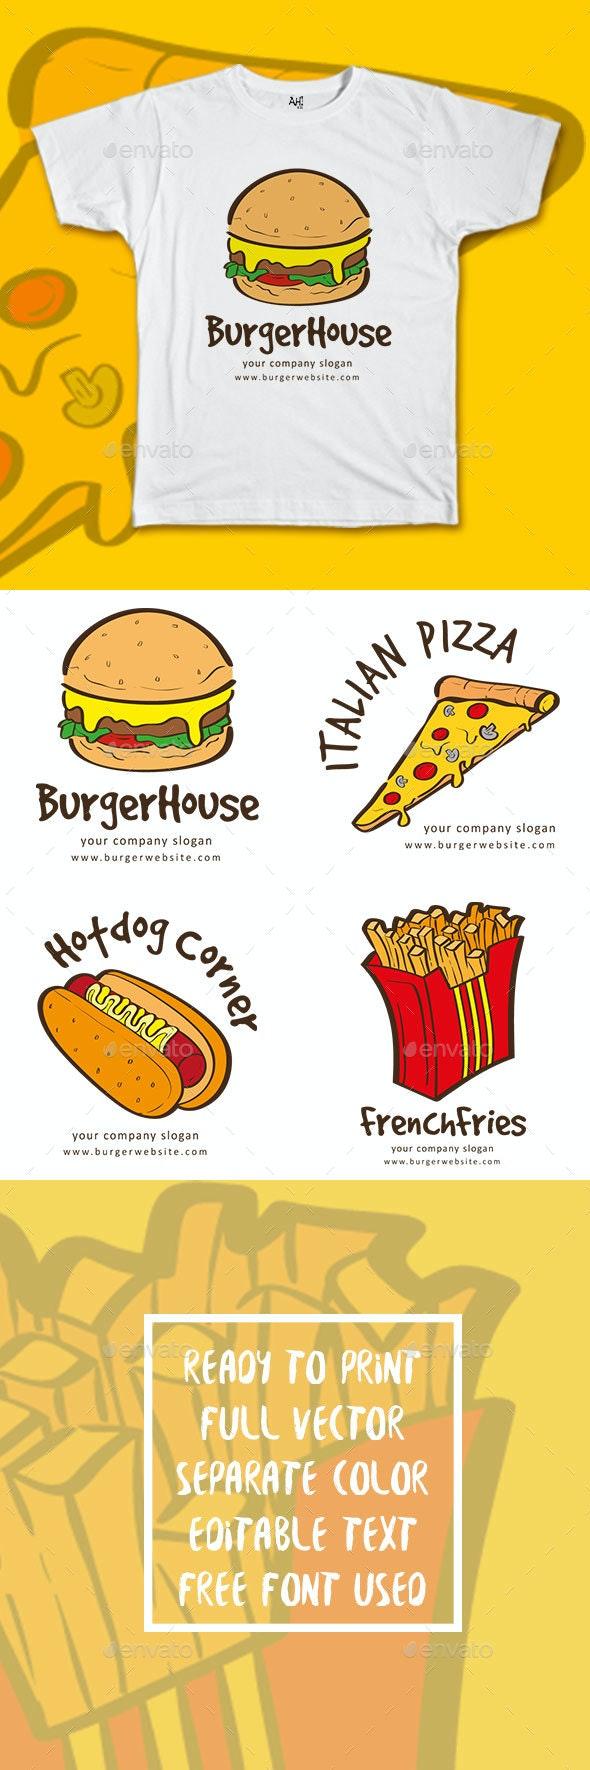 4 Restaurant Vector Design - Business T-Shirts